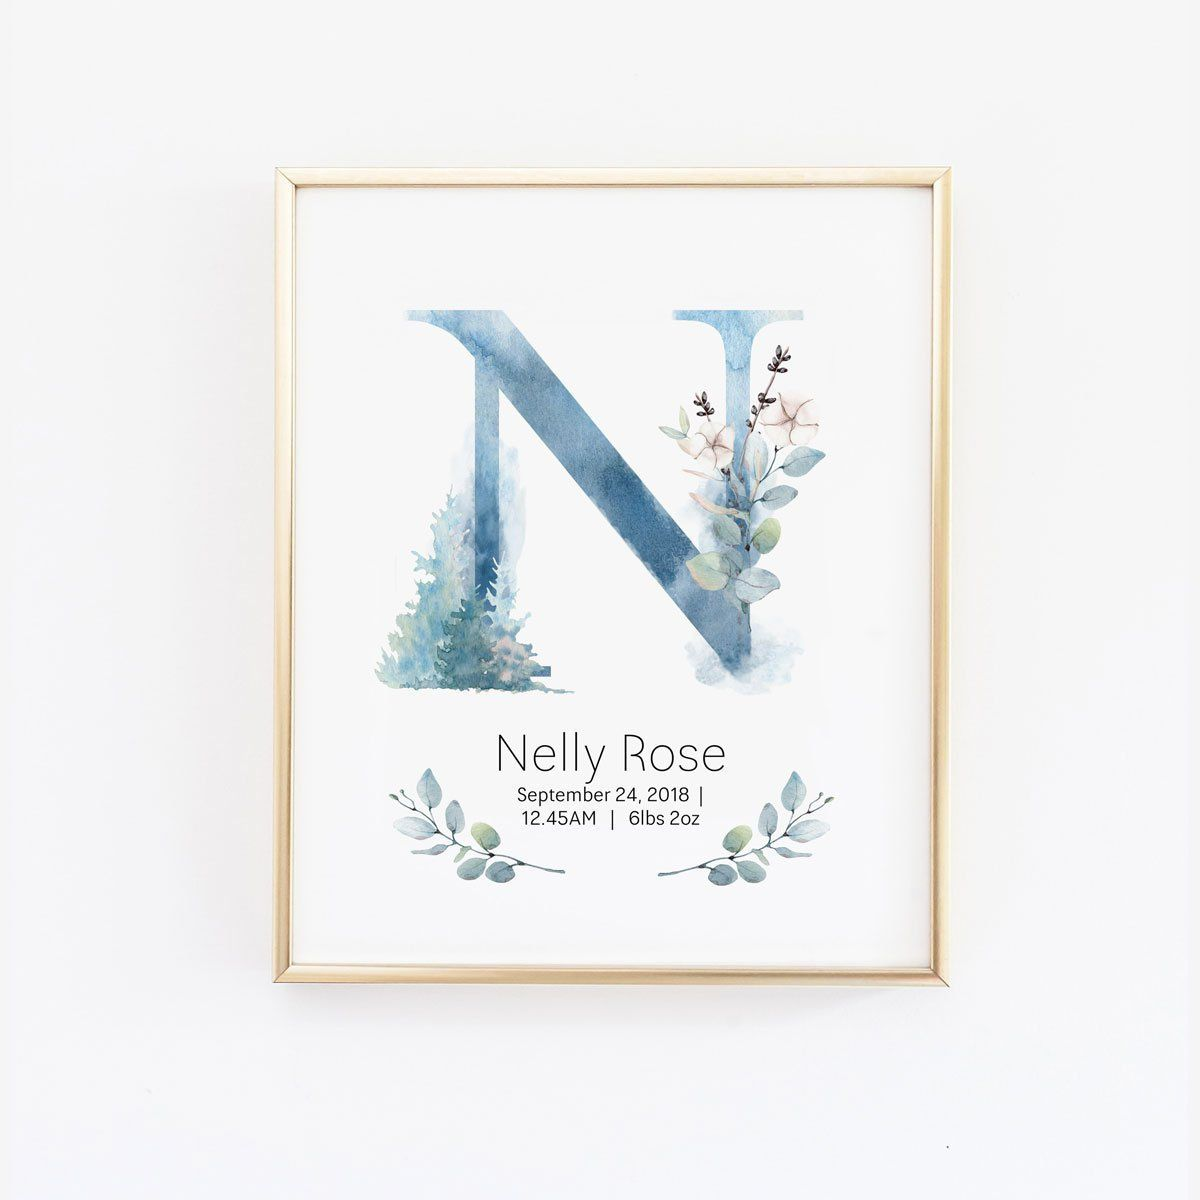 Personalized Name Poster For Nursery Baby Keepsake Nursery Etsy Name Wall Art Birth Announcement Wall Art Nursery Wall Art